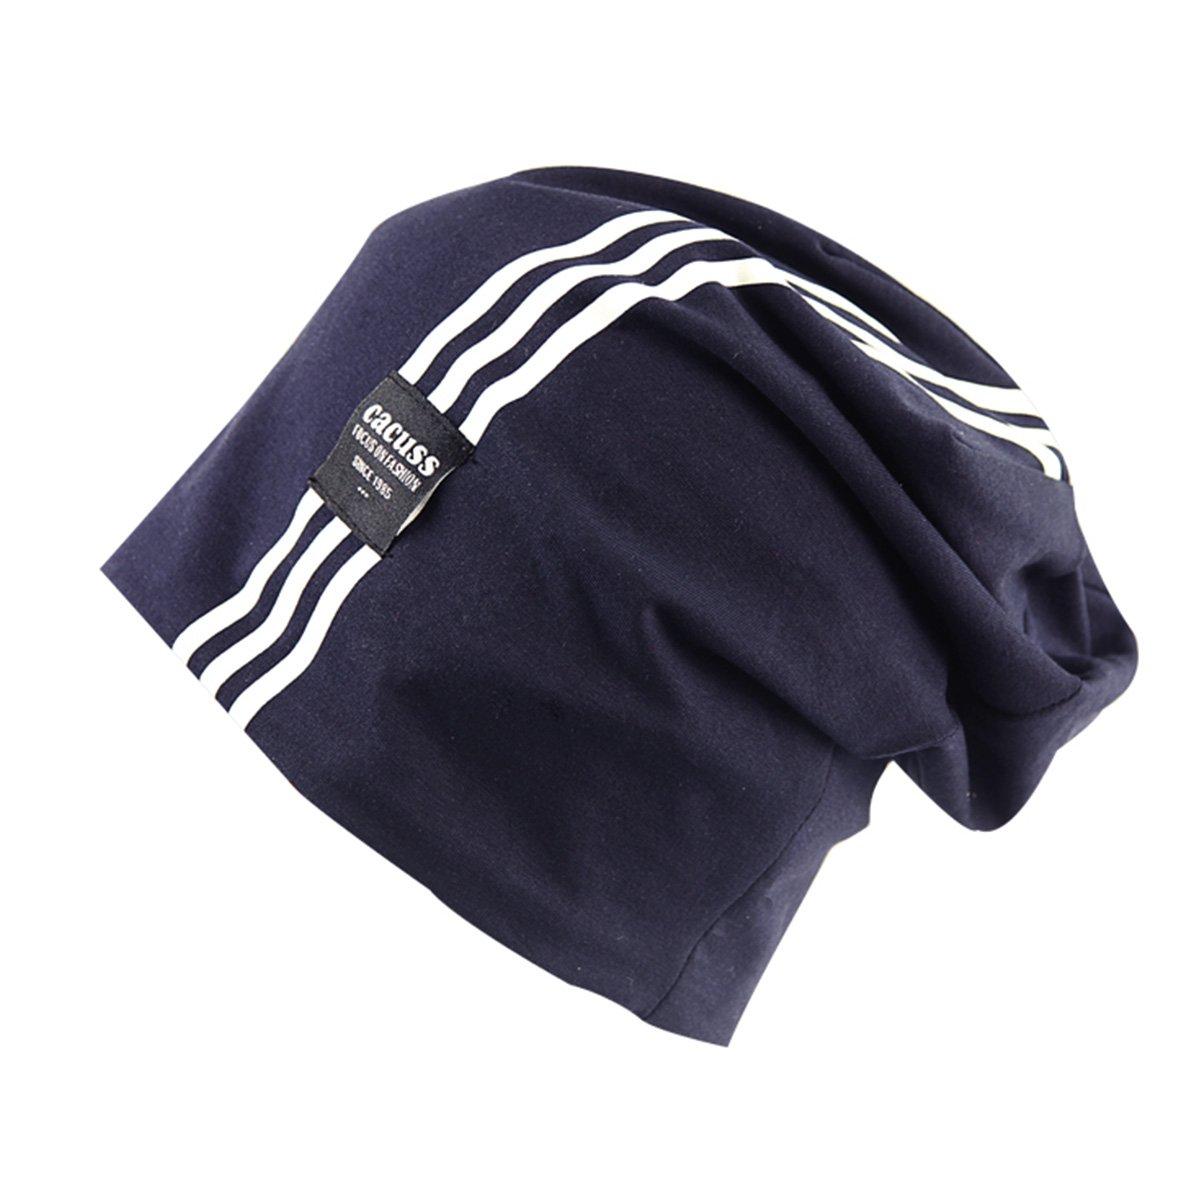 CACUSS Men Fashion Skull Cap Thin Slouchy Cotton Knit Beanie Hat